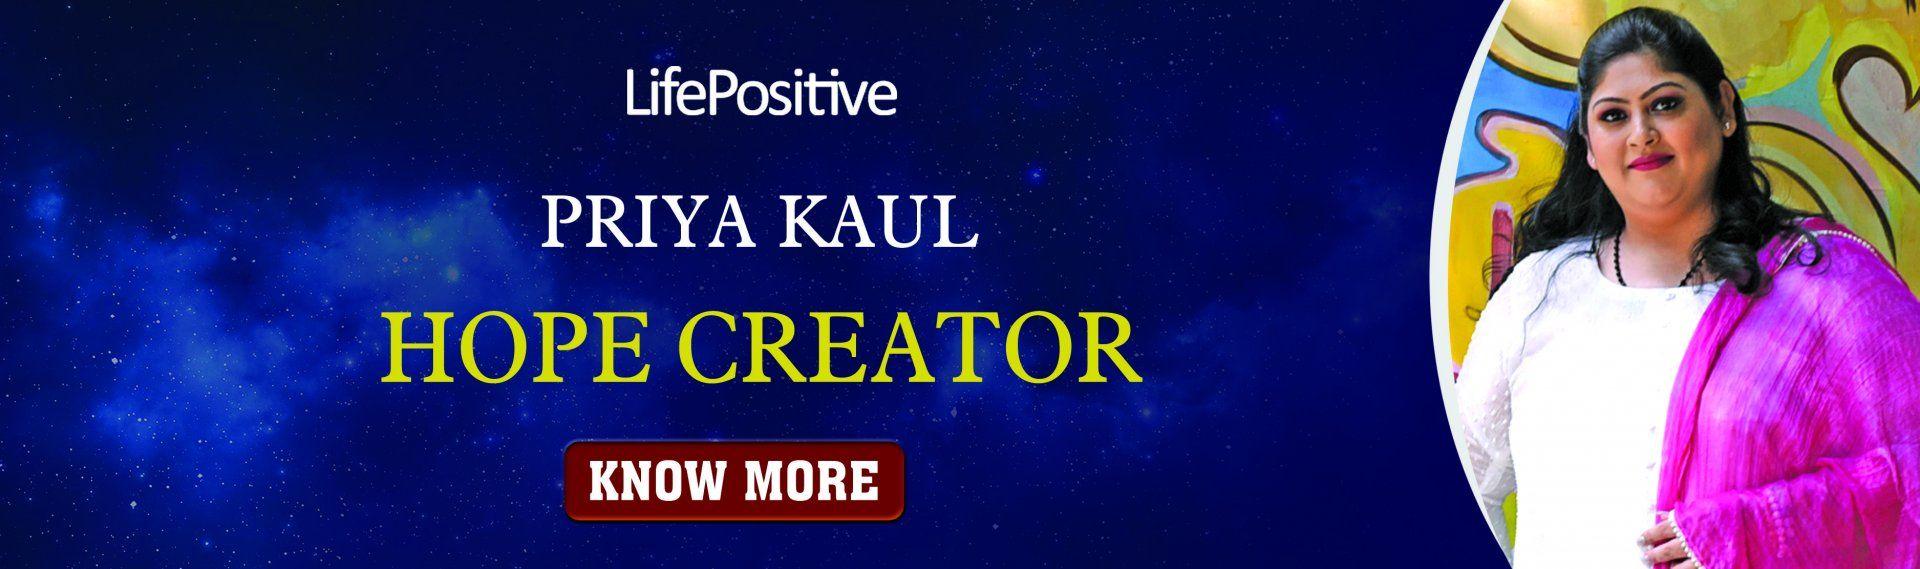 hope-creator